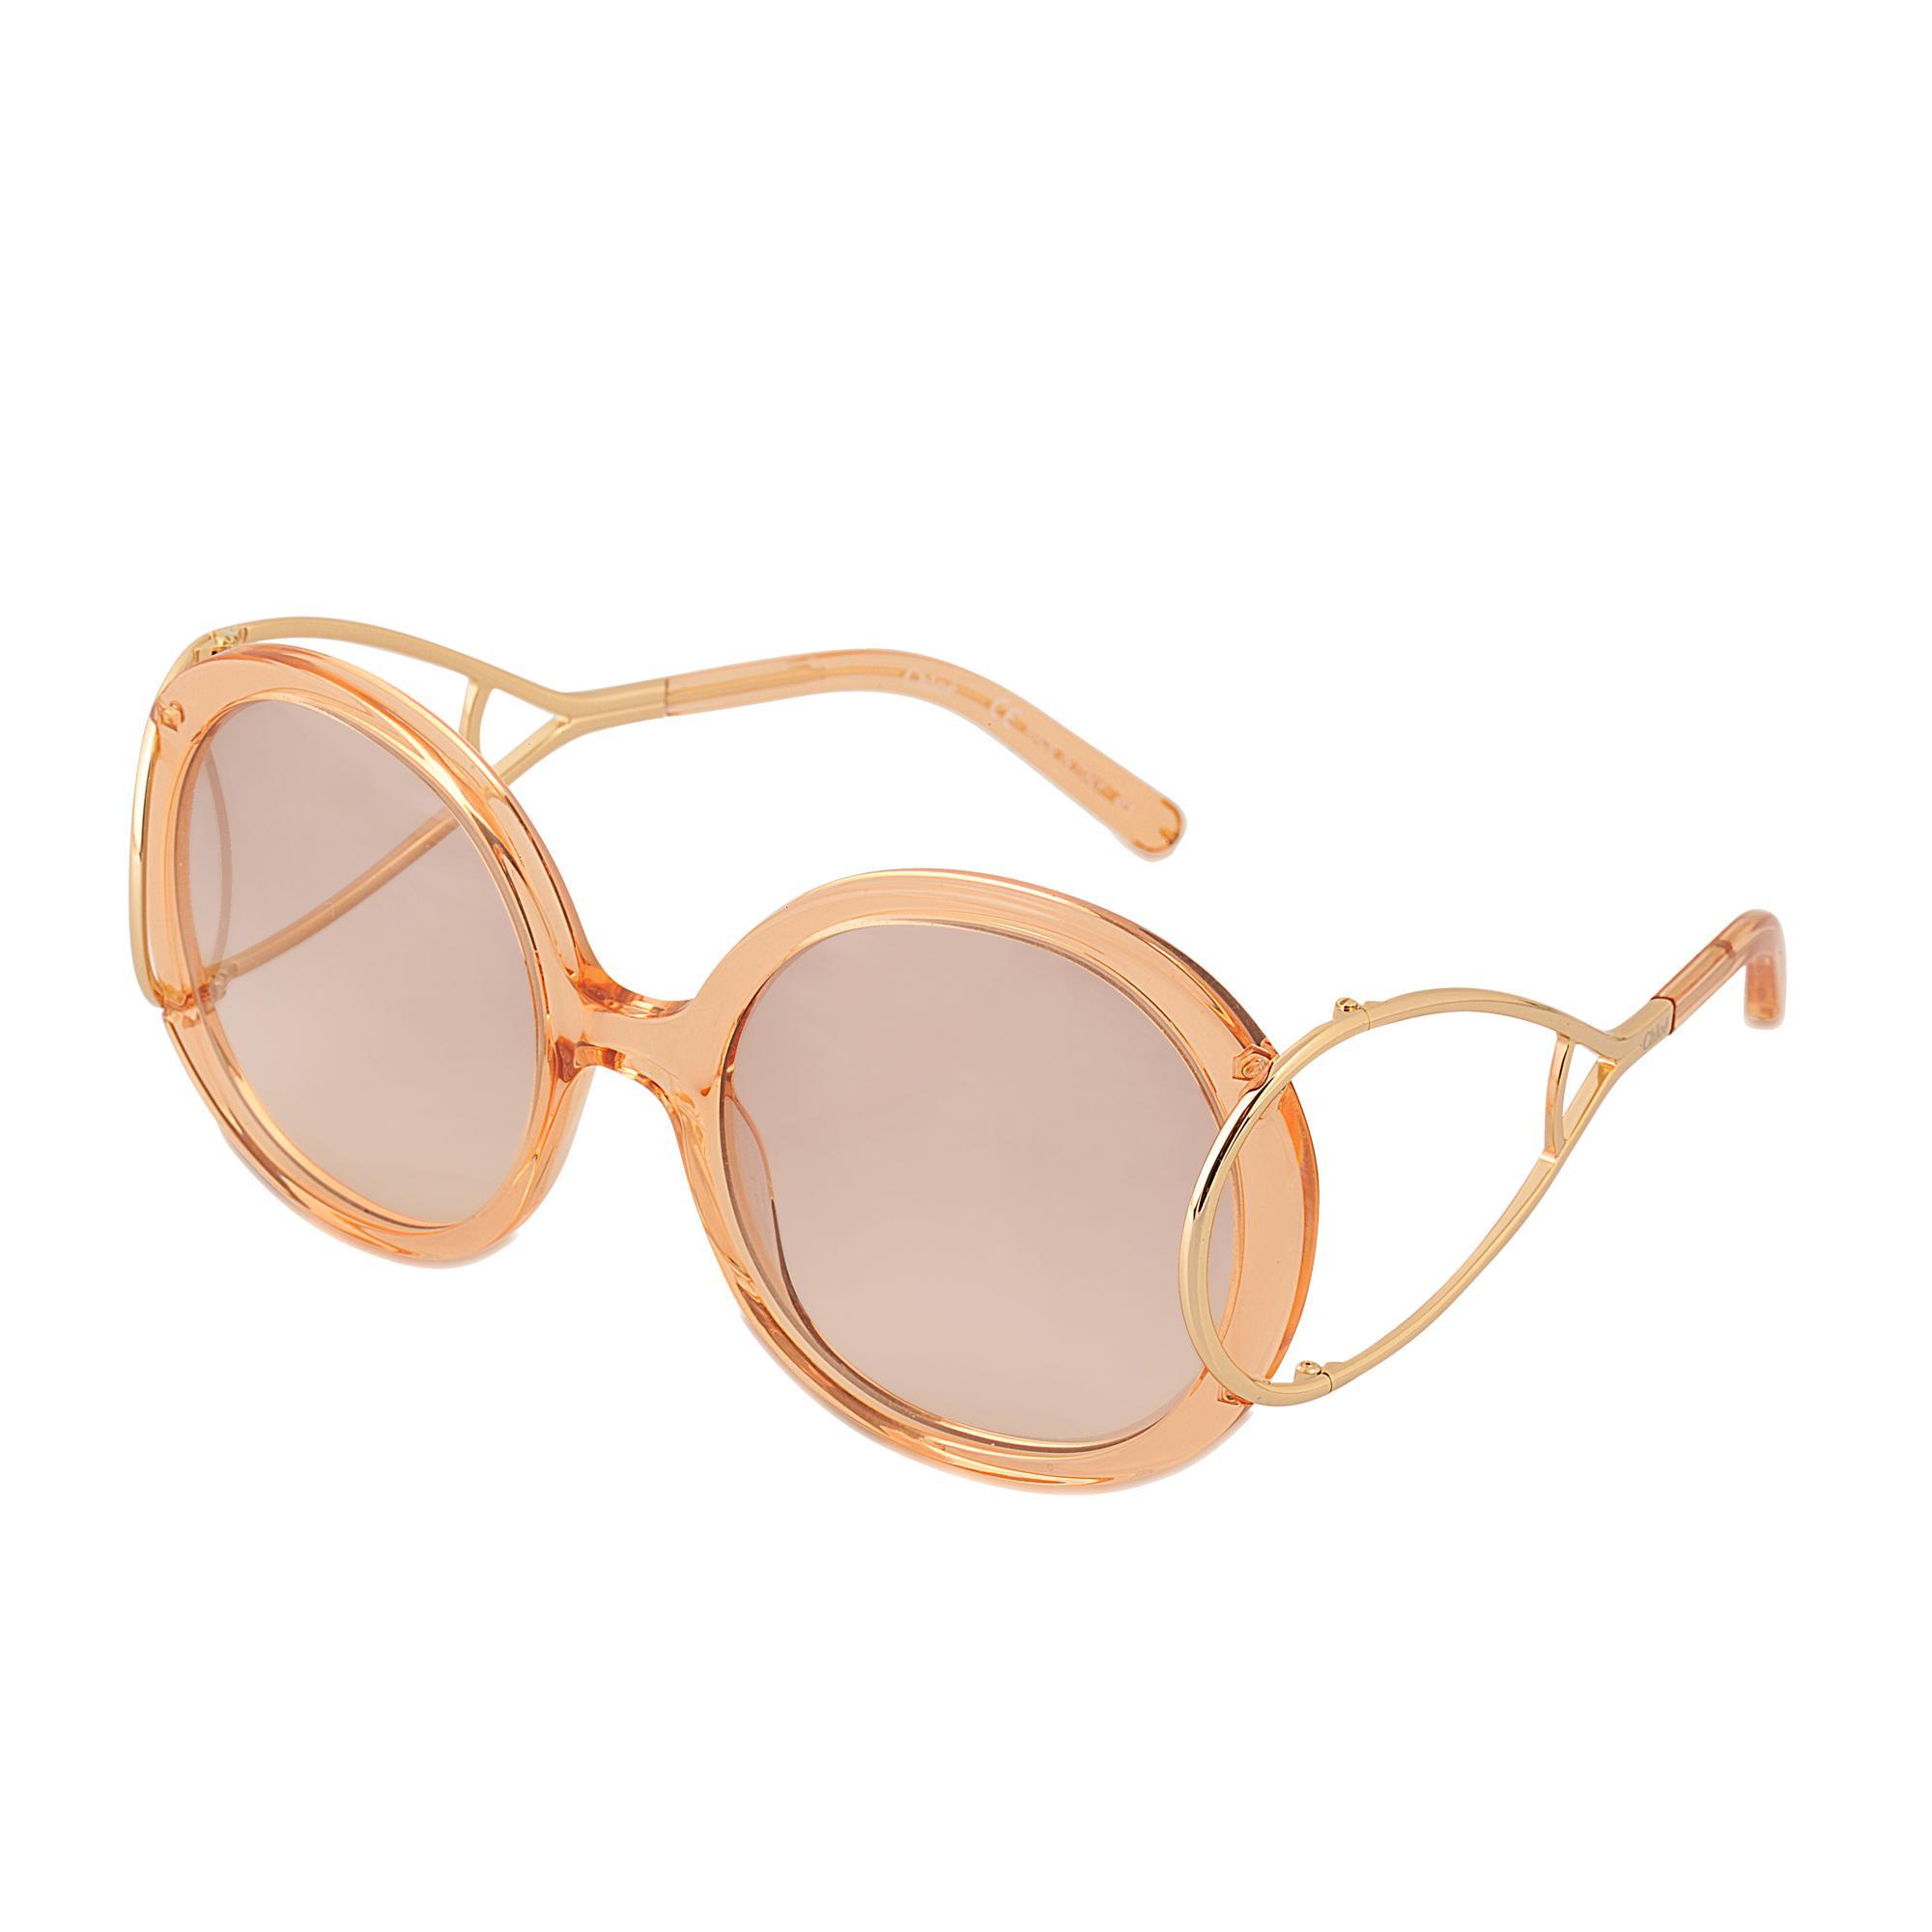 118032ed0da Chloé Ce703s Jackson Sunglasses in Natural - Lyst